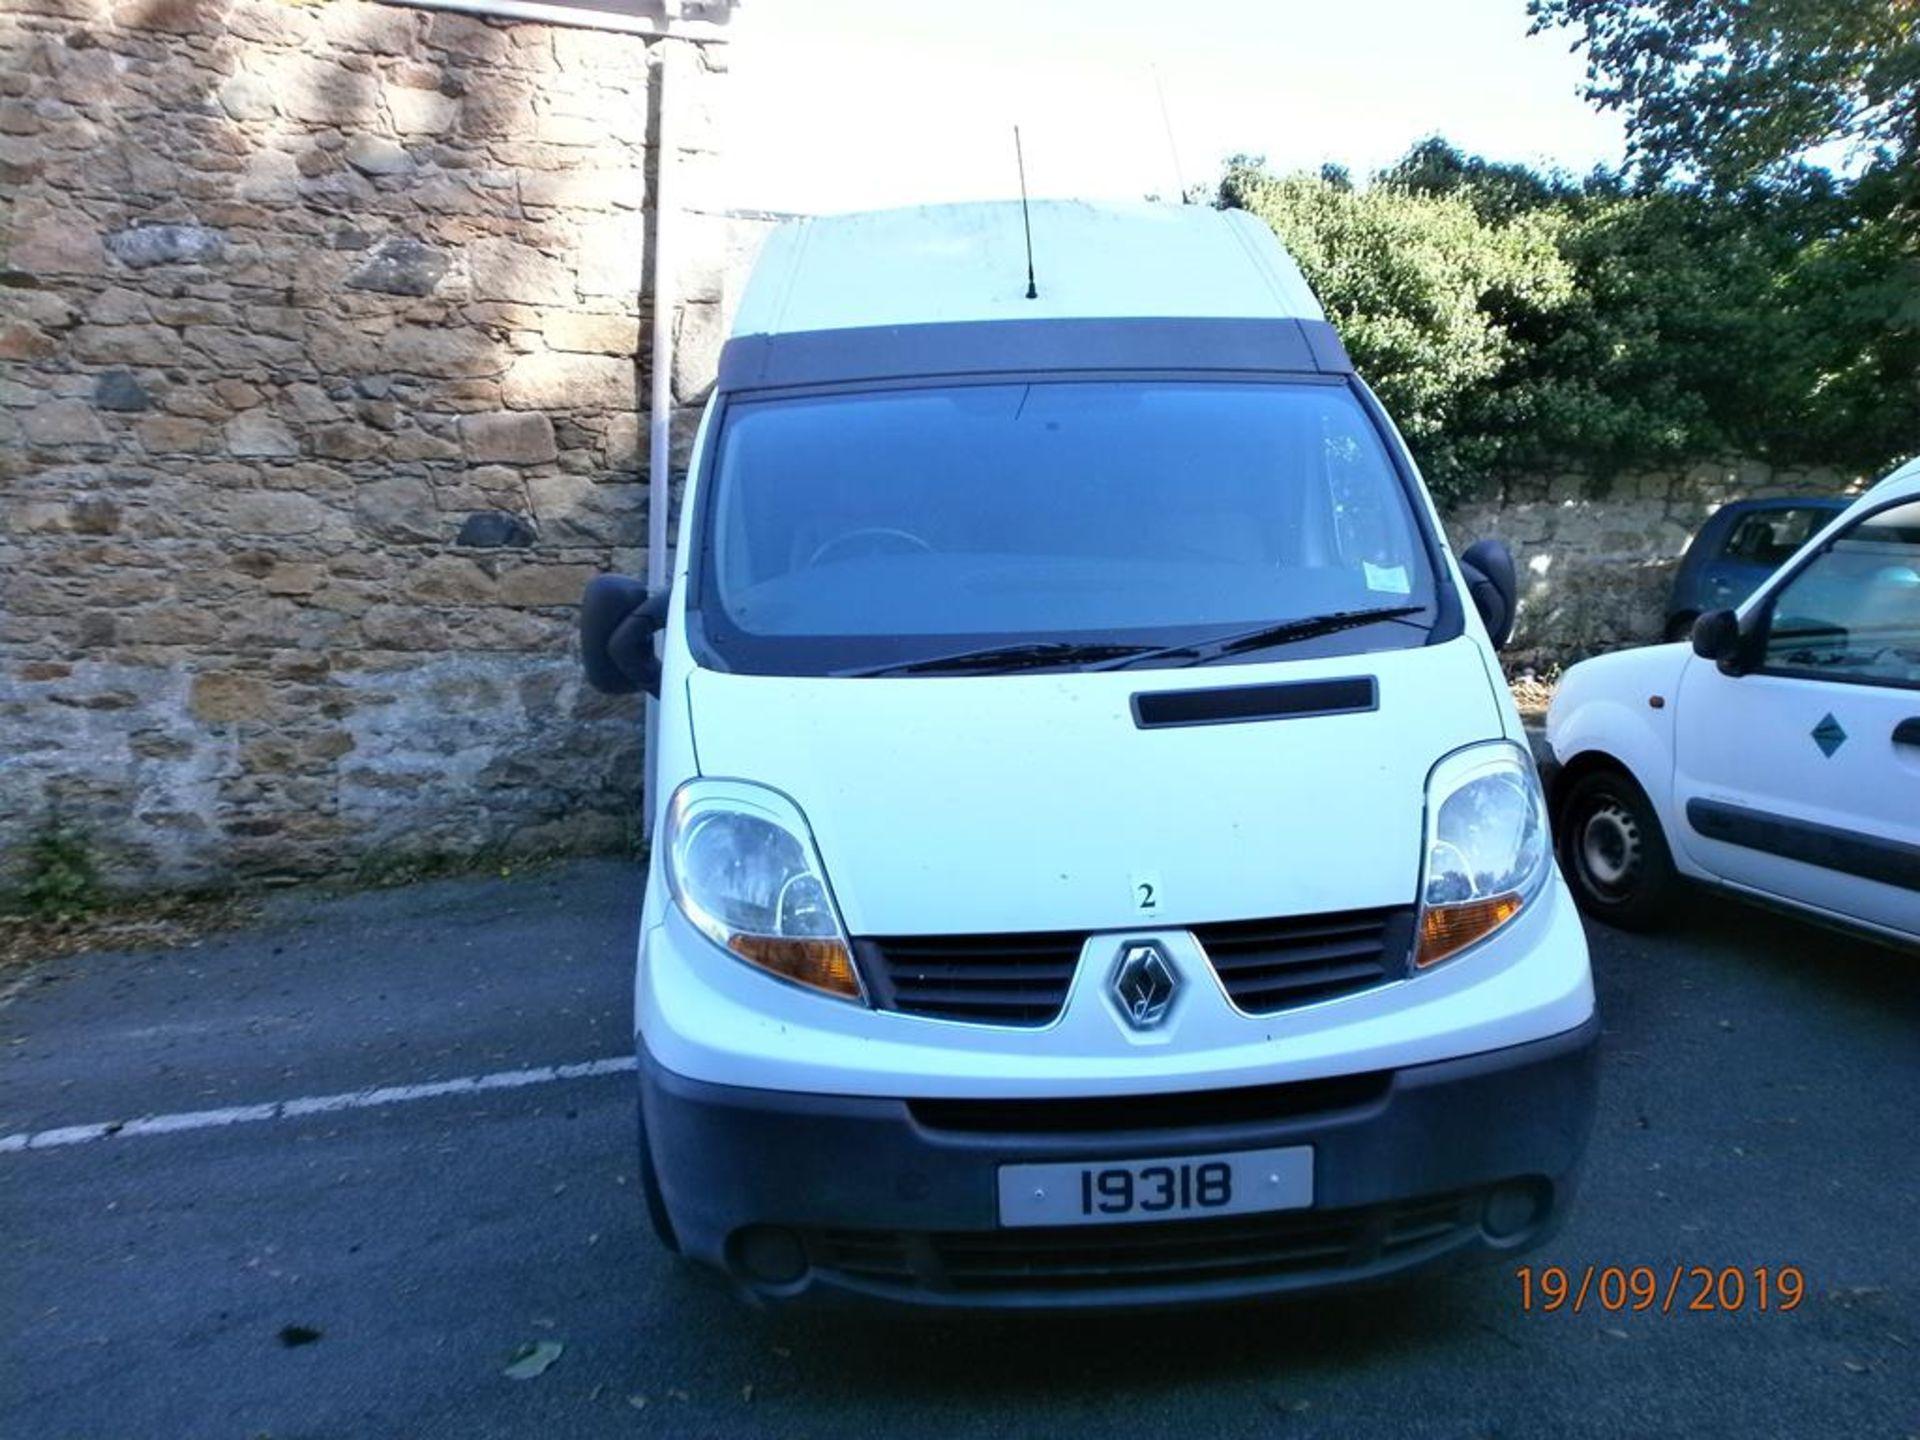 Lot 2 - Renault Trafic Hi-Roof Panel Van